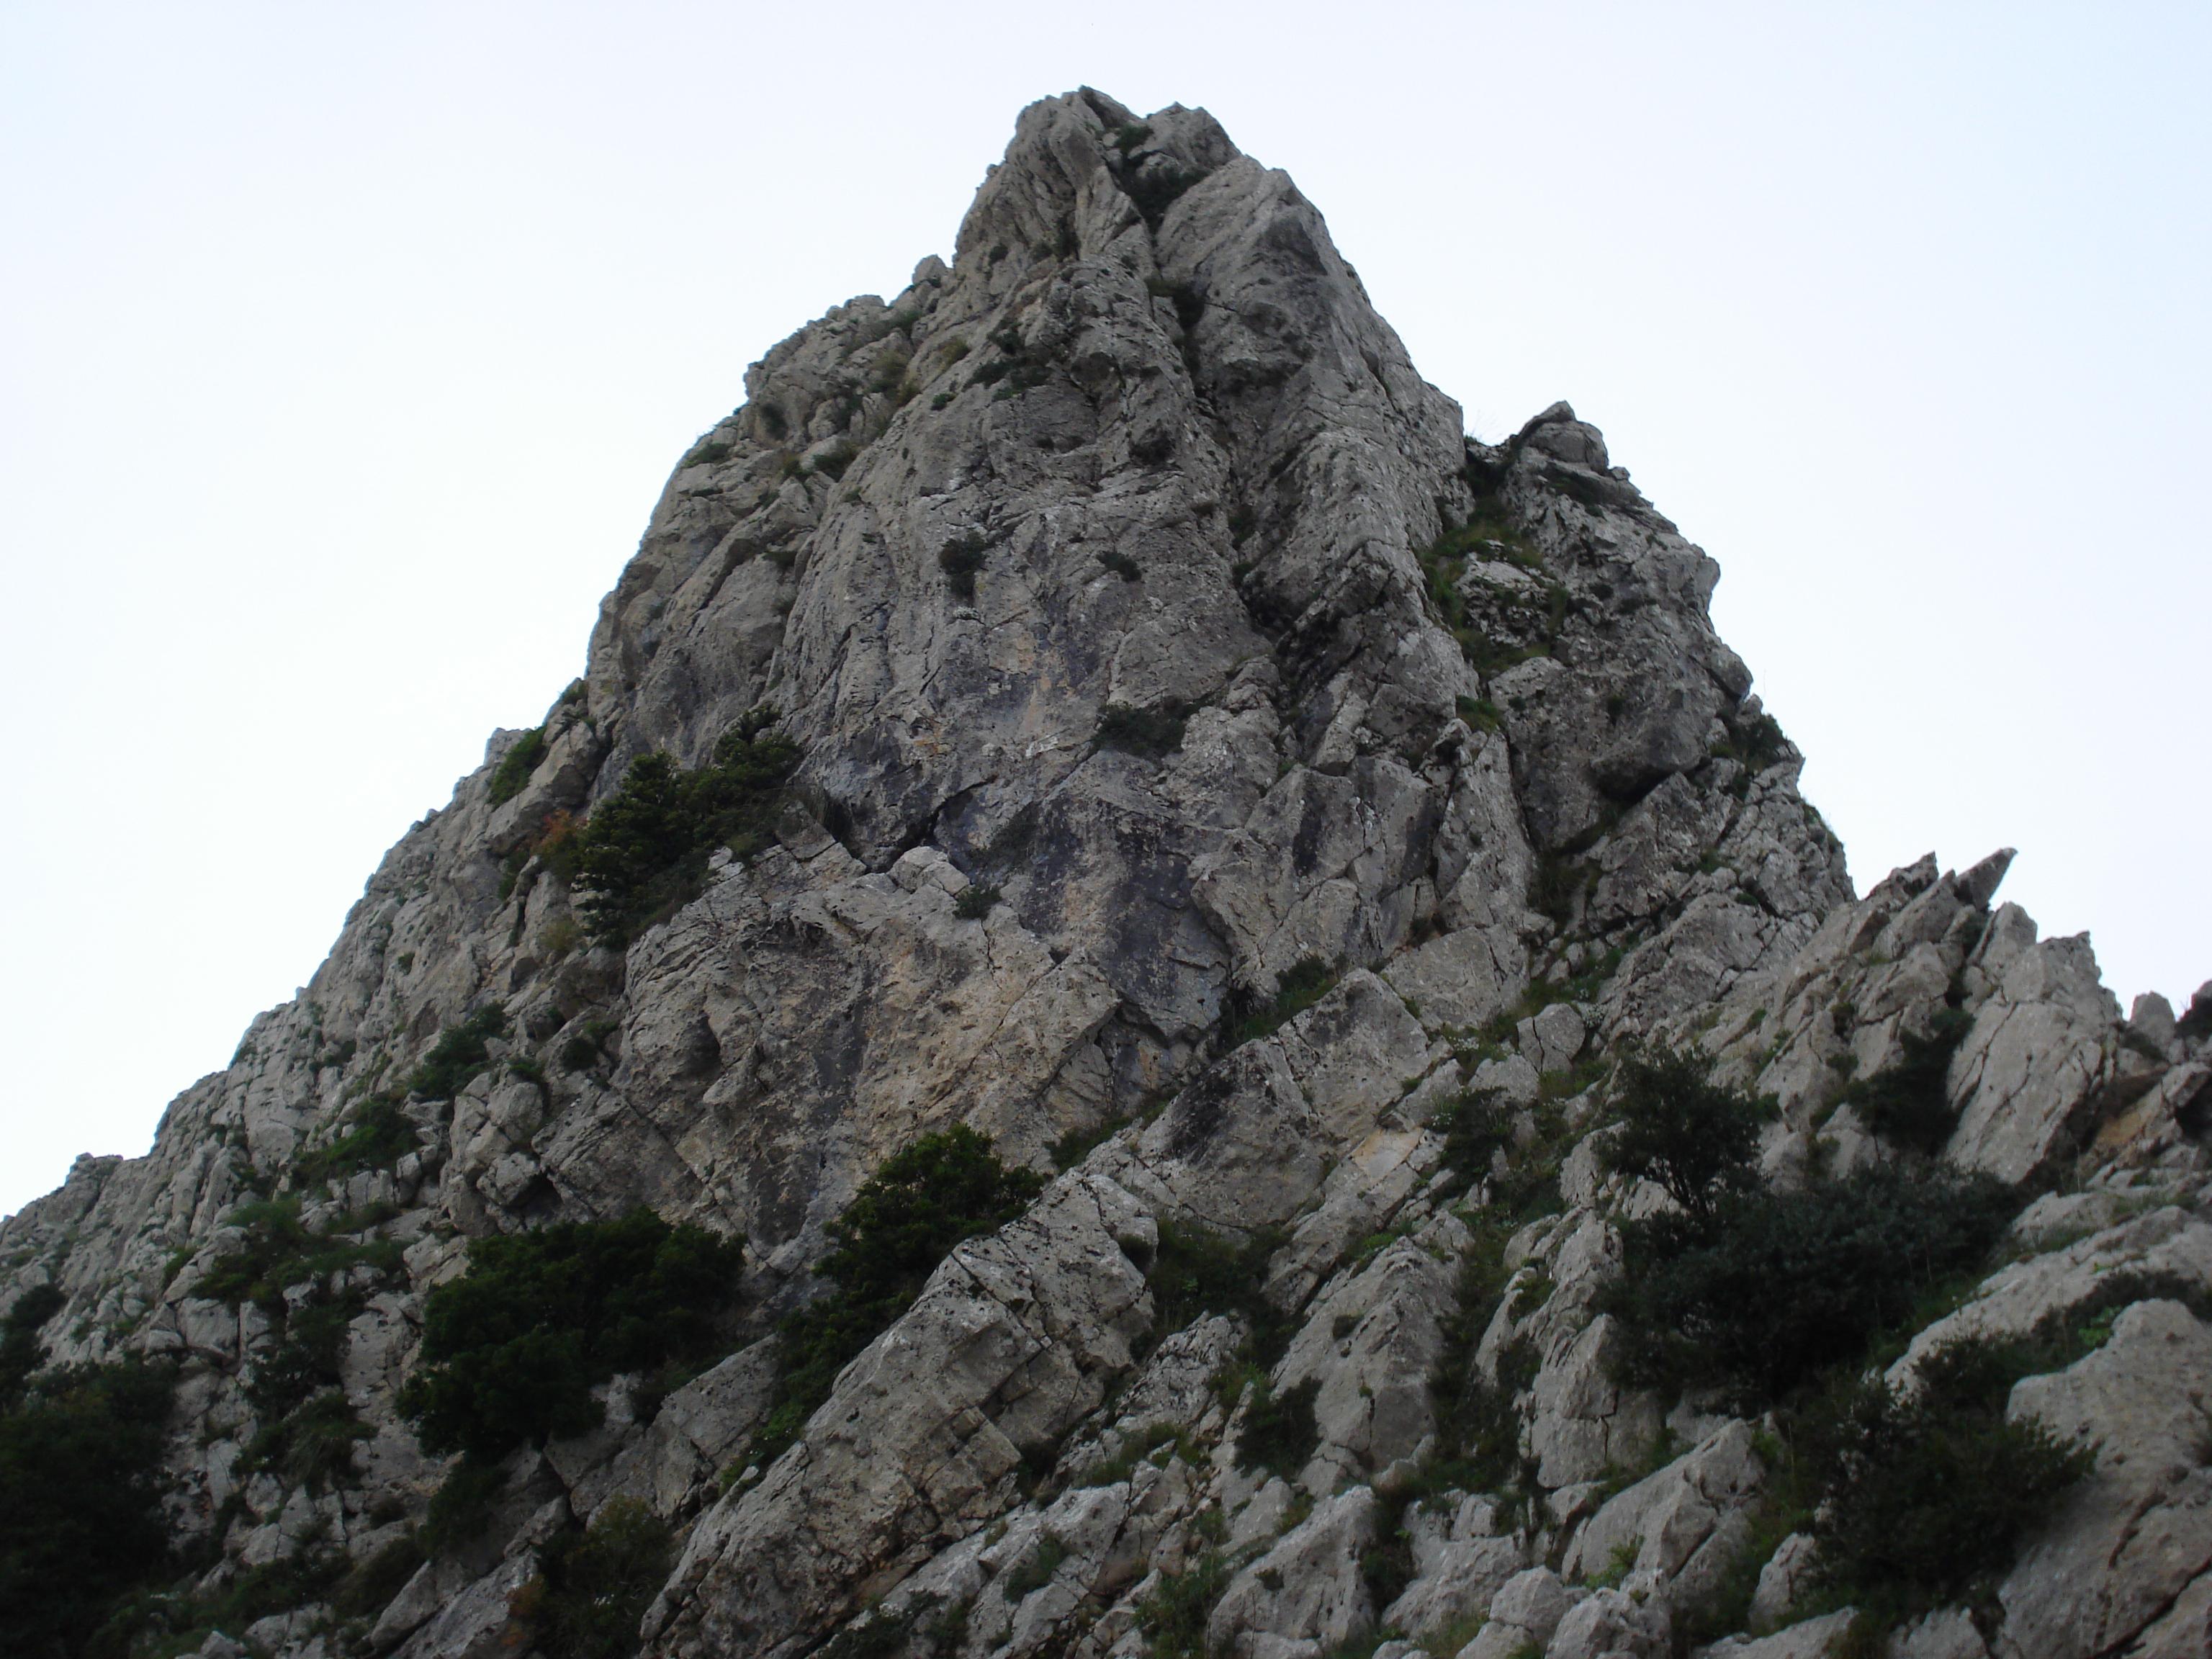 بالصور تفسير حلم ورؤية الجبال والصخور والتلال بالمنام aa1bd5323c4e5bfe5b1d19c5a87cc9a1